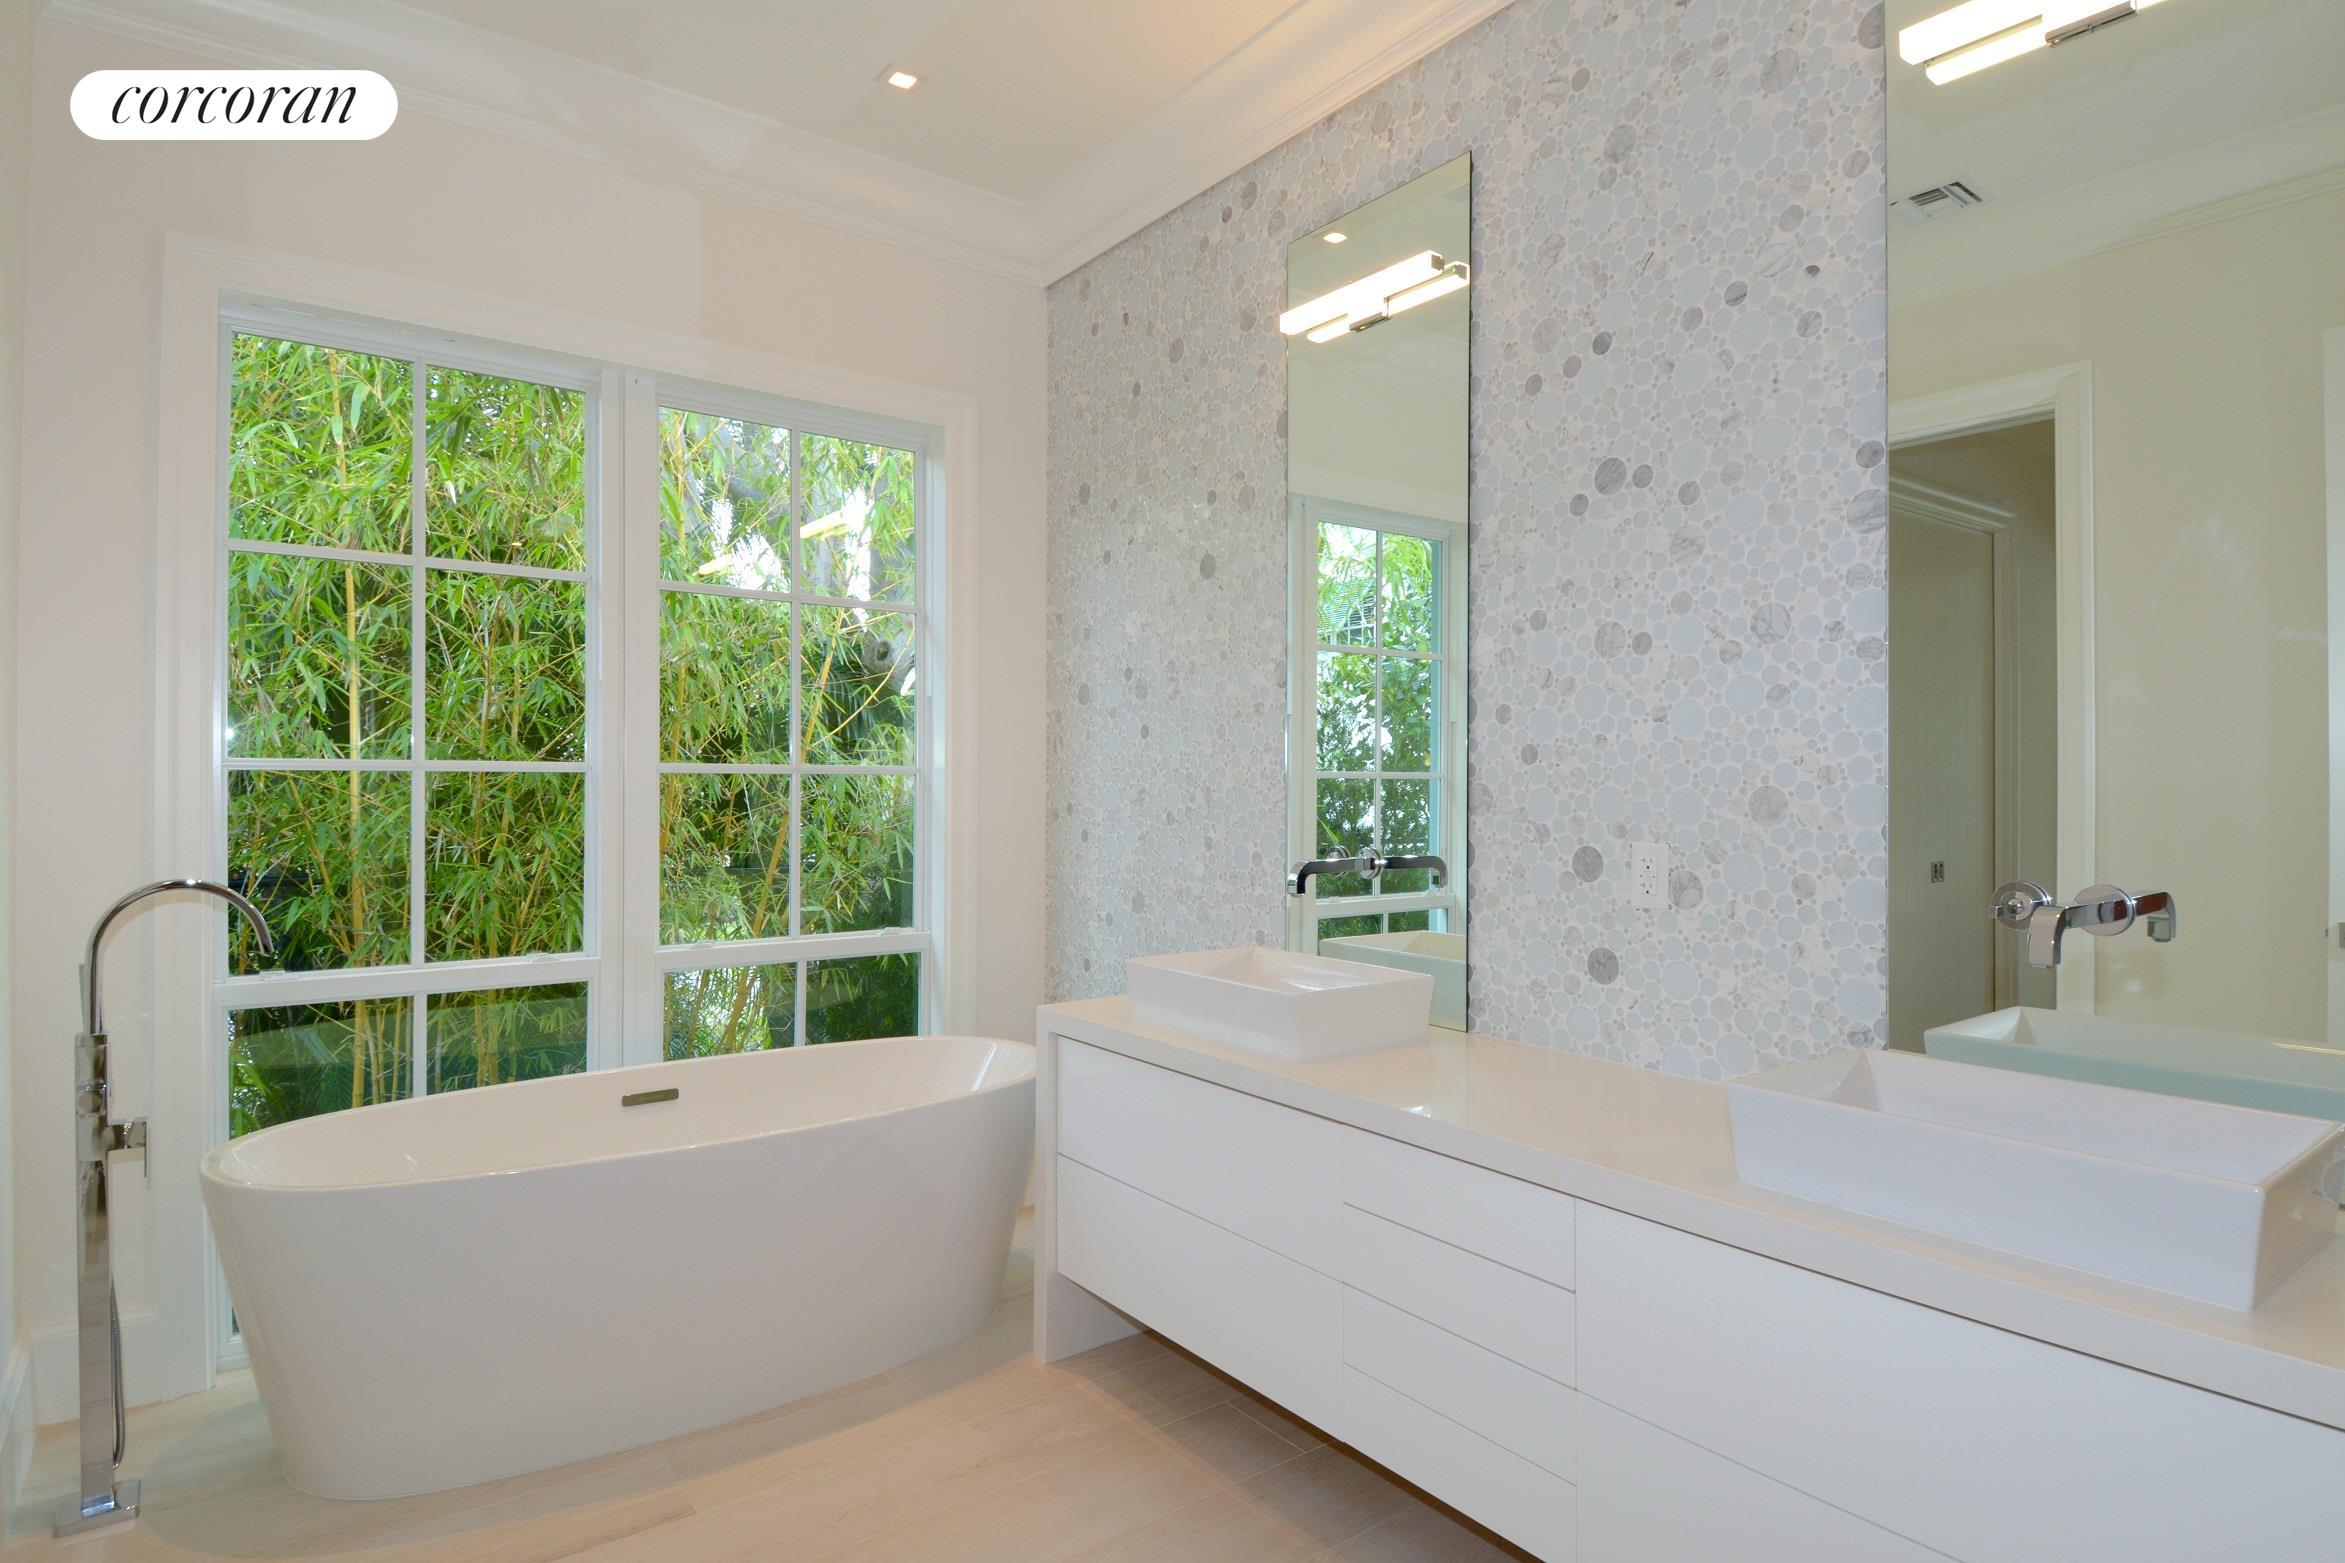 Corcoran, 815 NE 1st Court, Delray Beach Real Estate, South Florida ...